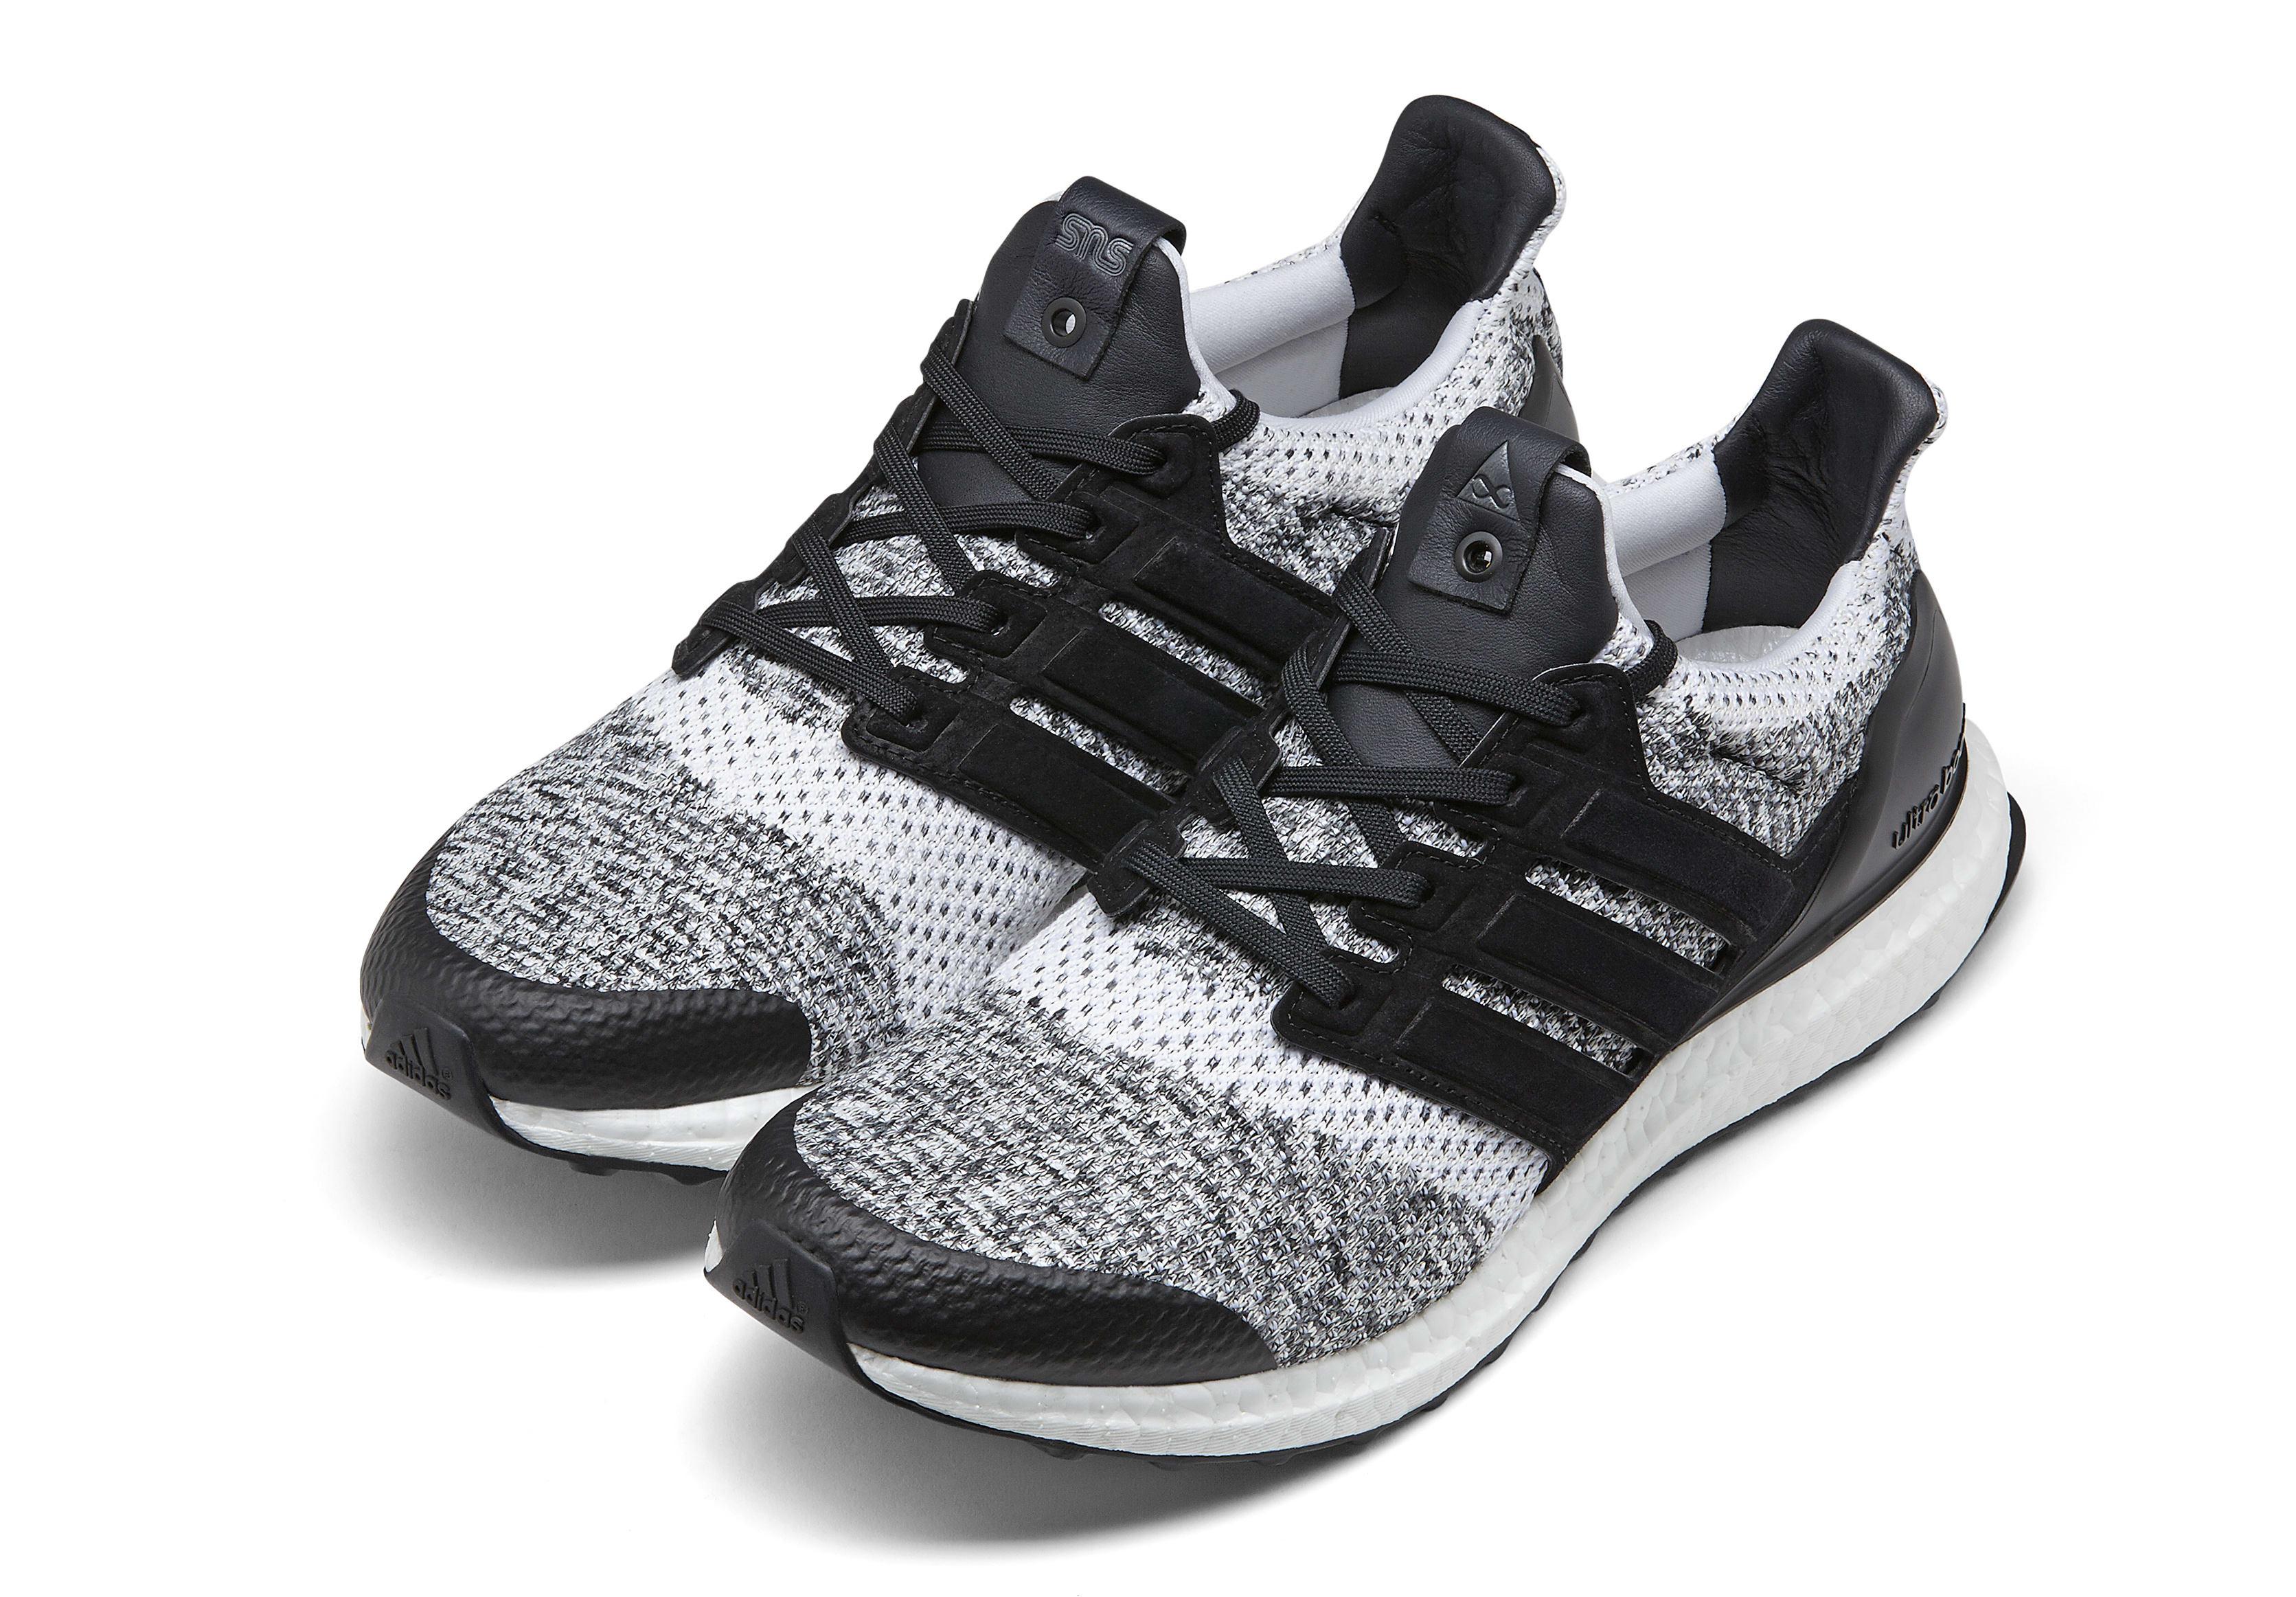 Sneakersnstuff Social Status Adidas Ultra Boost